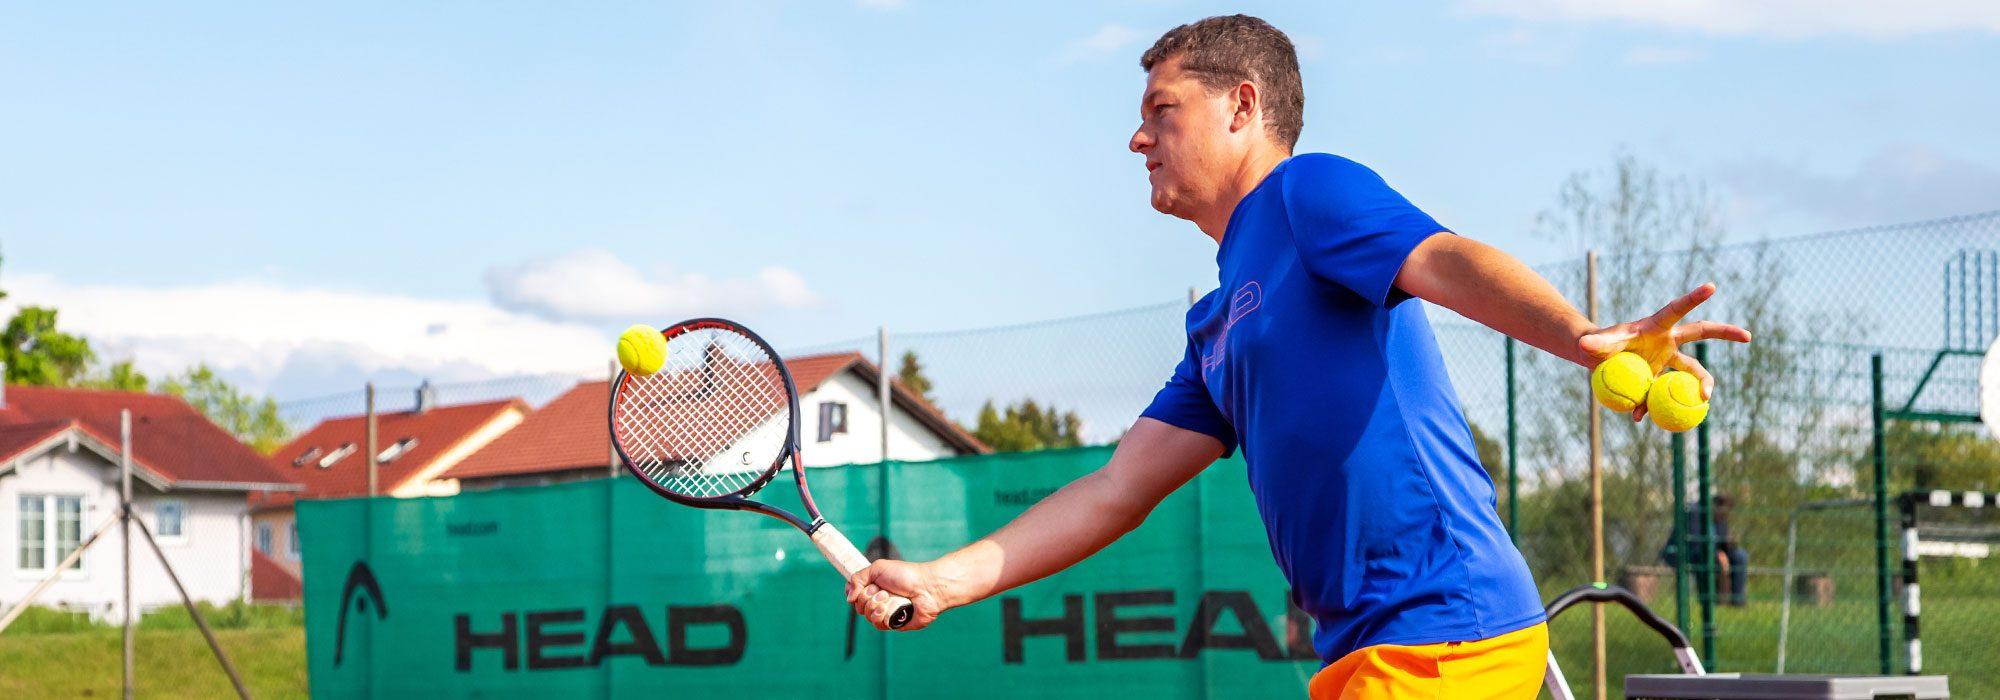 Kontakt | Tennislehrer Raimund Knogler